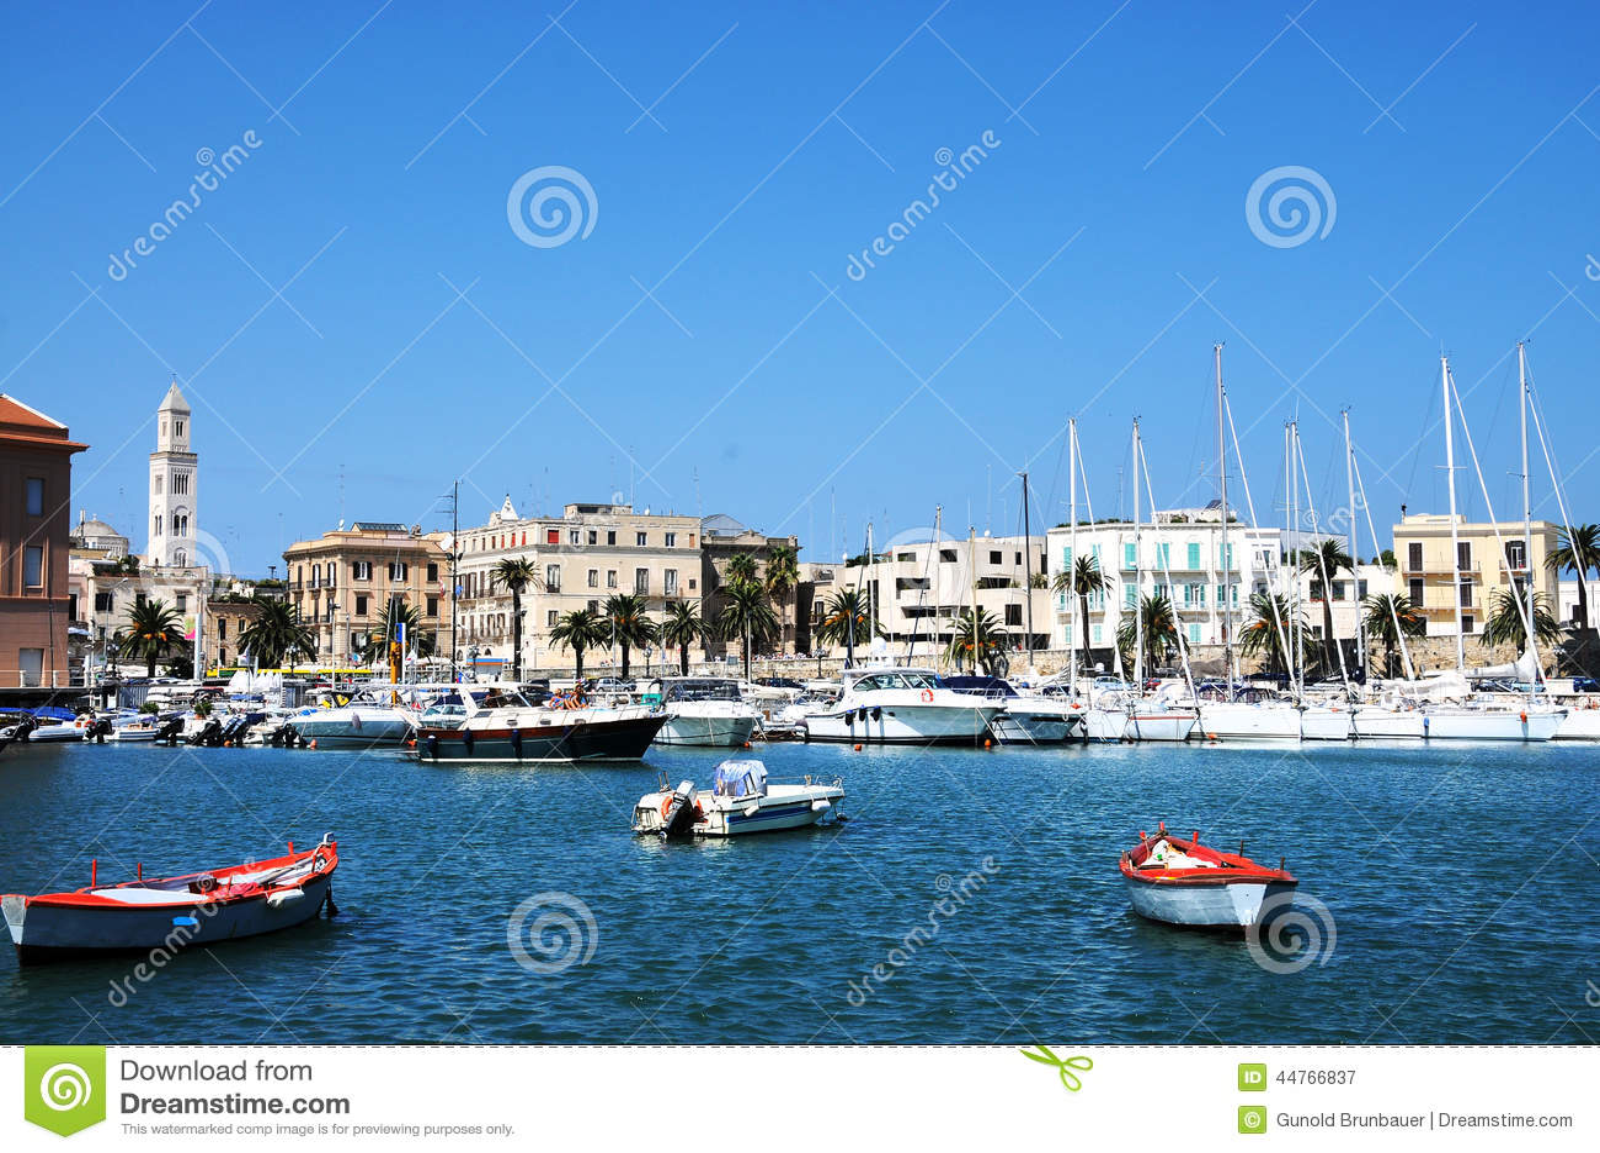 Port in Bari